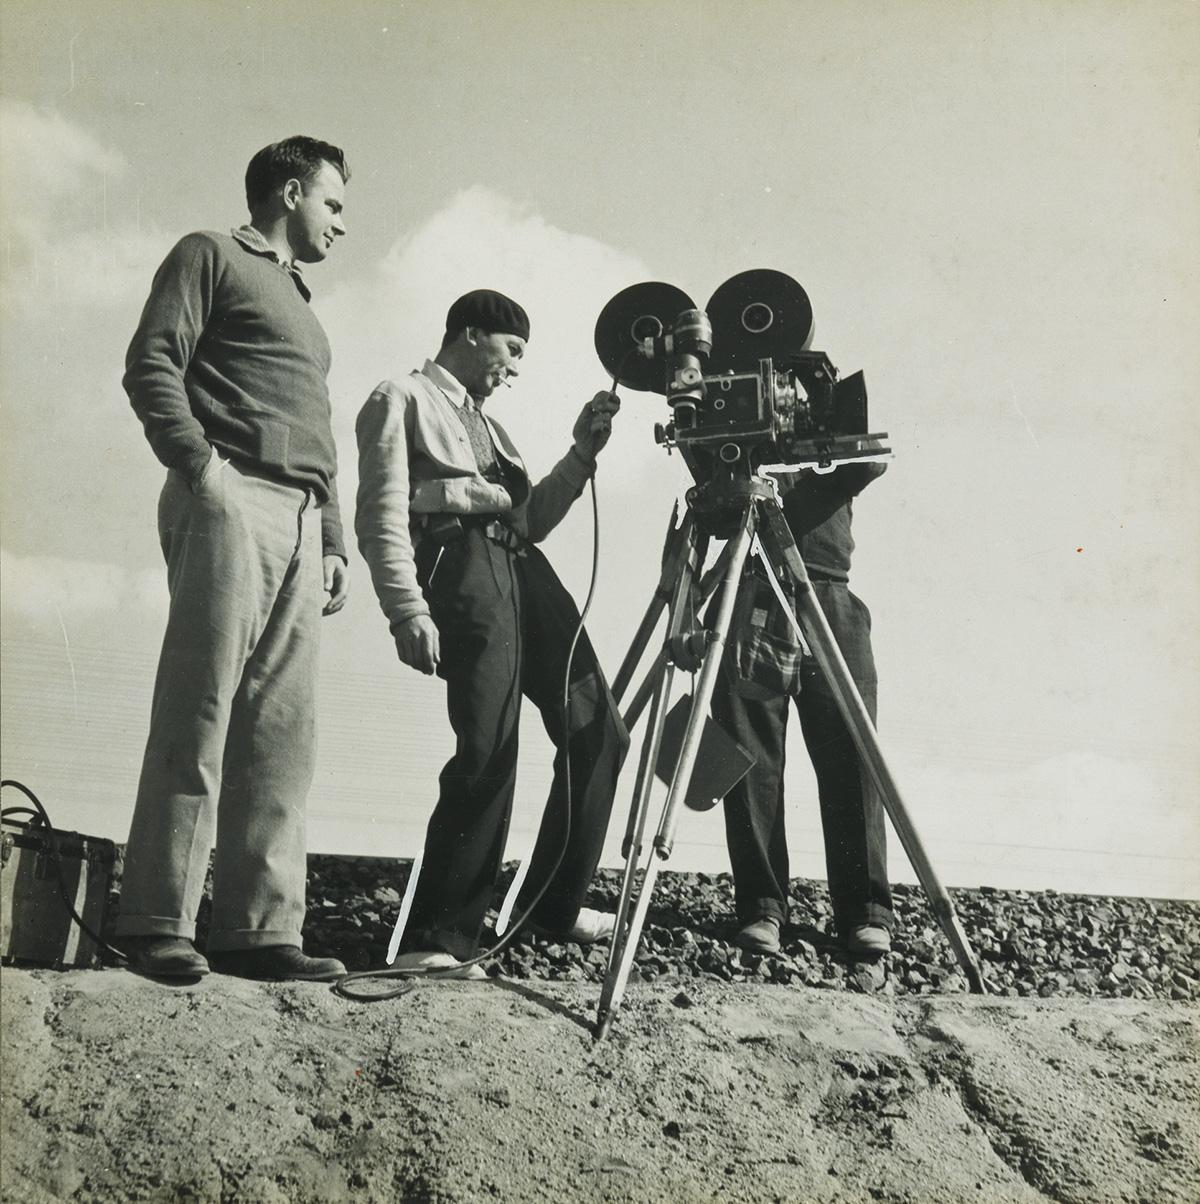 DOROTHEA LANGE (1895-1965) Pare Lorentz and Paul Ivano Making Resettlement Film Near Bakersfield, California.